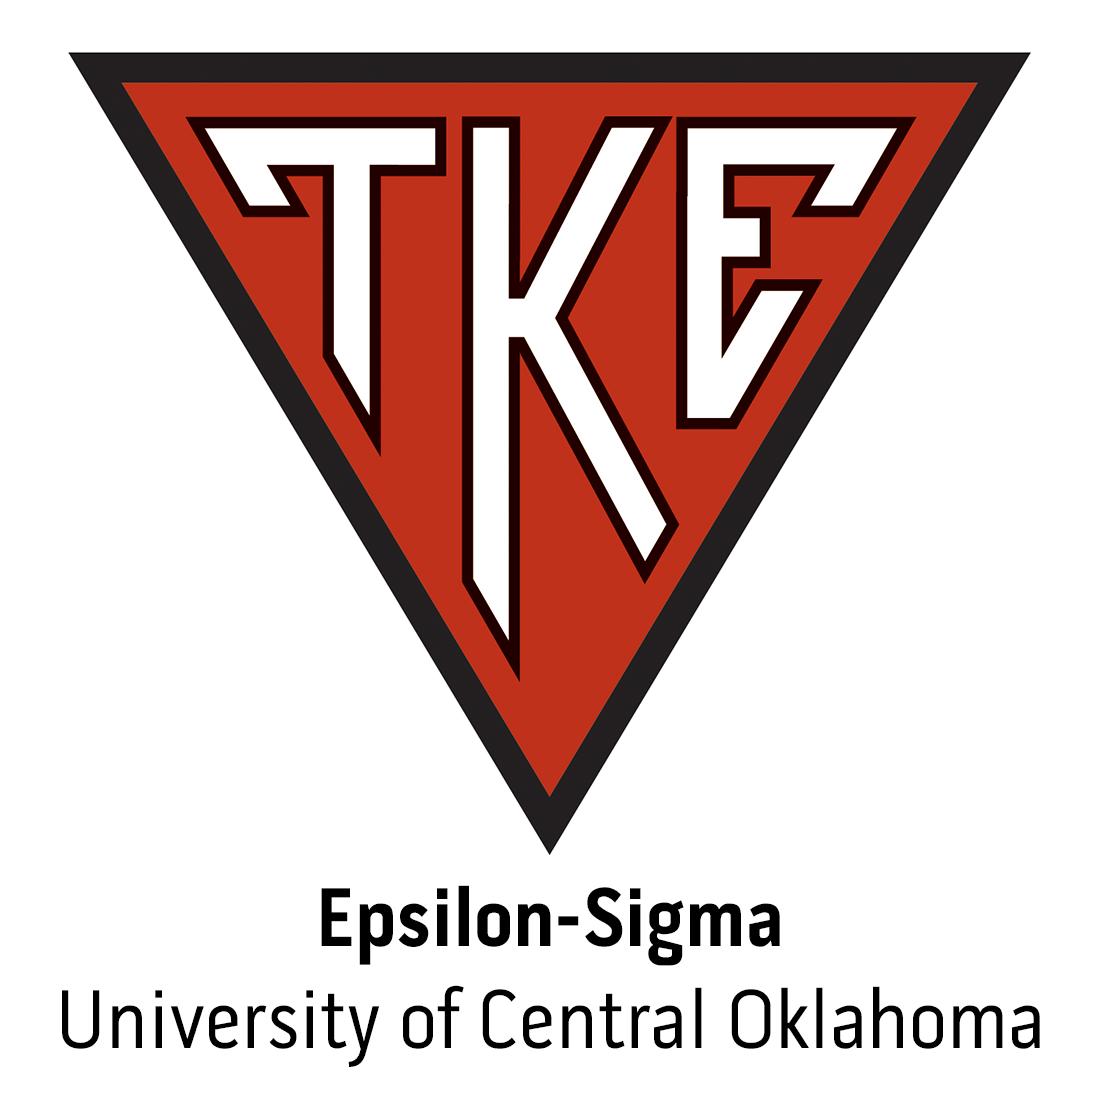 Epsilon-Sigma C at University of Central Oklahoma